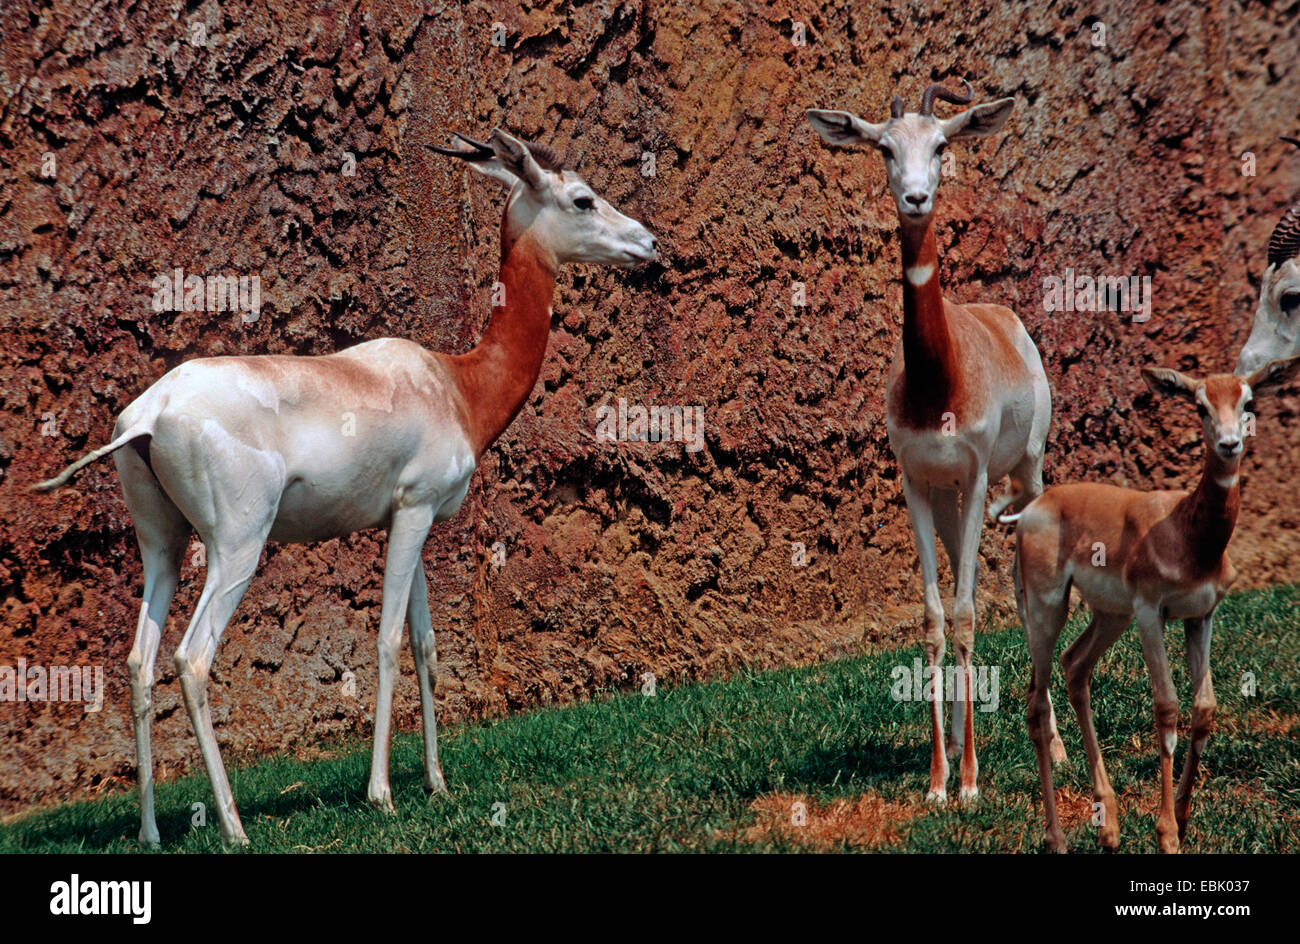 Addra gazelle (Gazella dama), in the zoo with pub - Stock Image